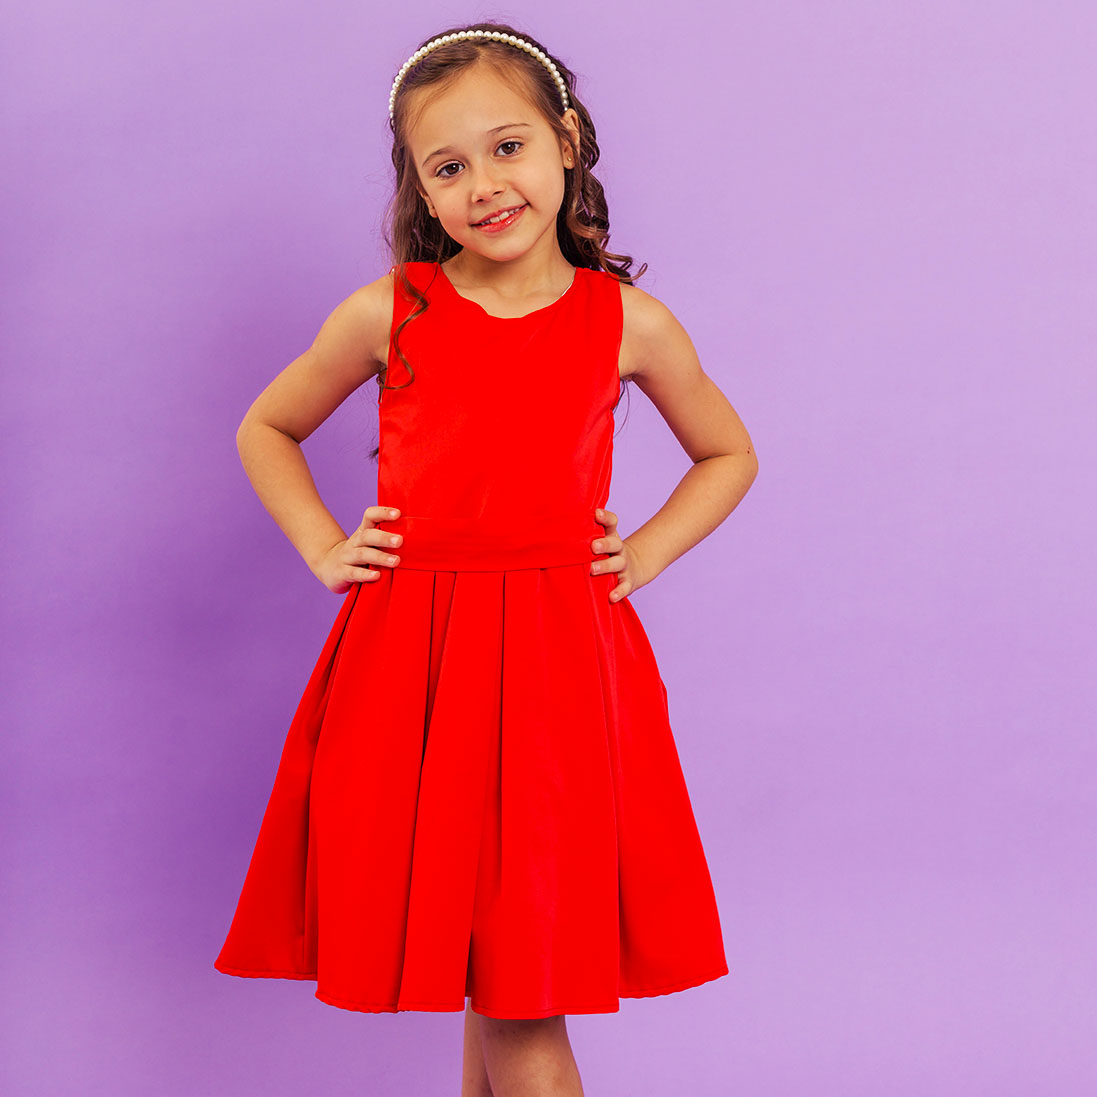 Vestido Infantil Liso Vermelho